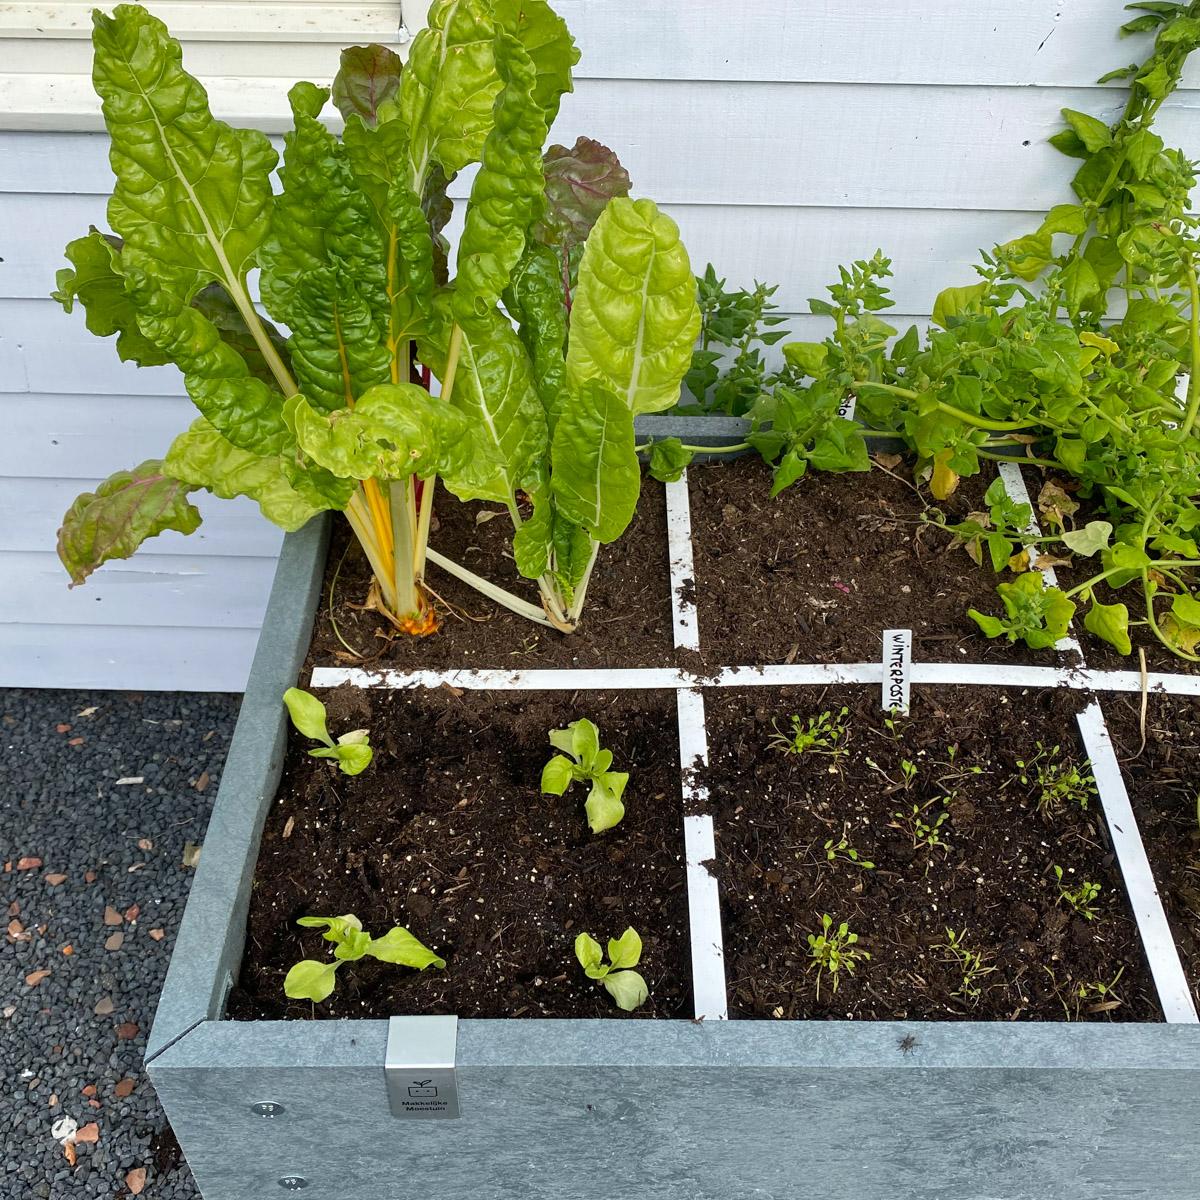 Seasonal-content_-Sept-in-the-planty-garden4.jpg